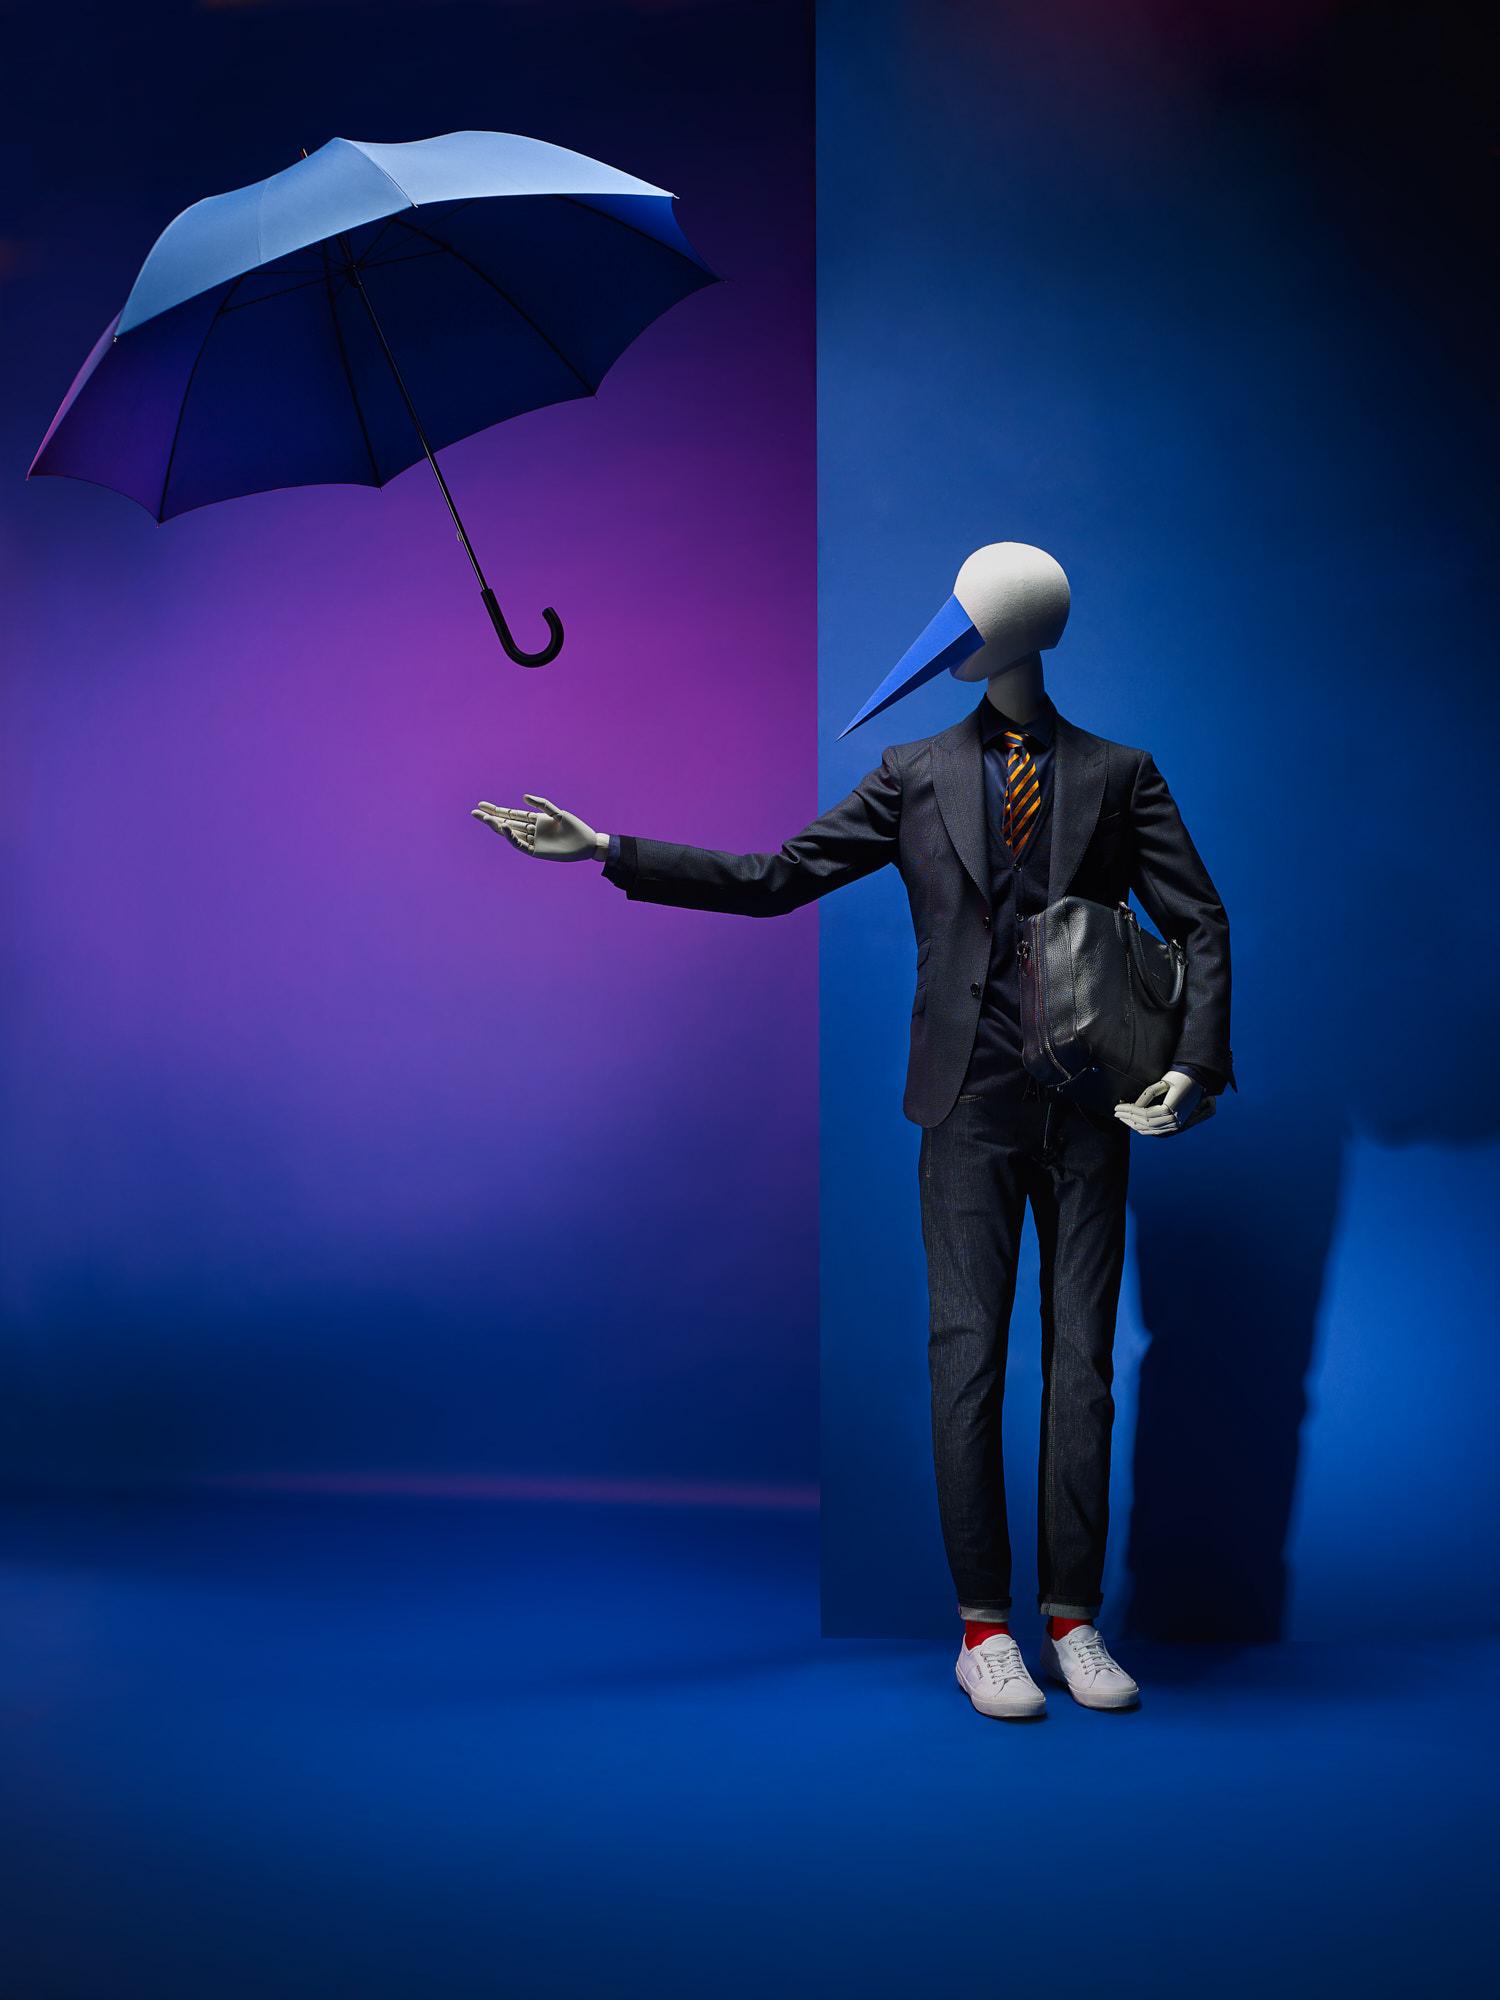 bernd-westphal-stillstars-vanlaack-mannequin-fashion-still-life-photography-004